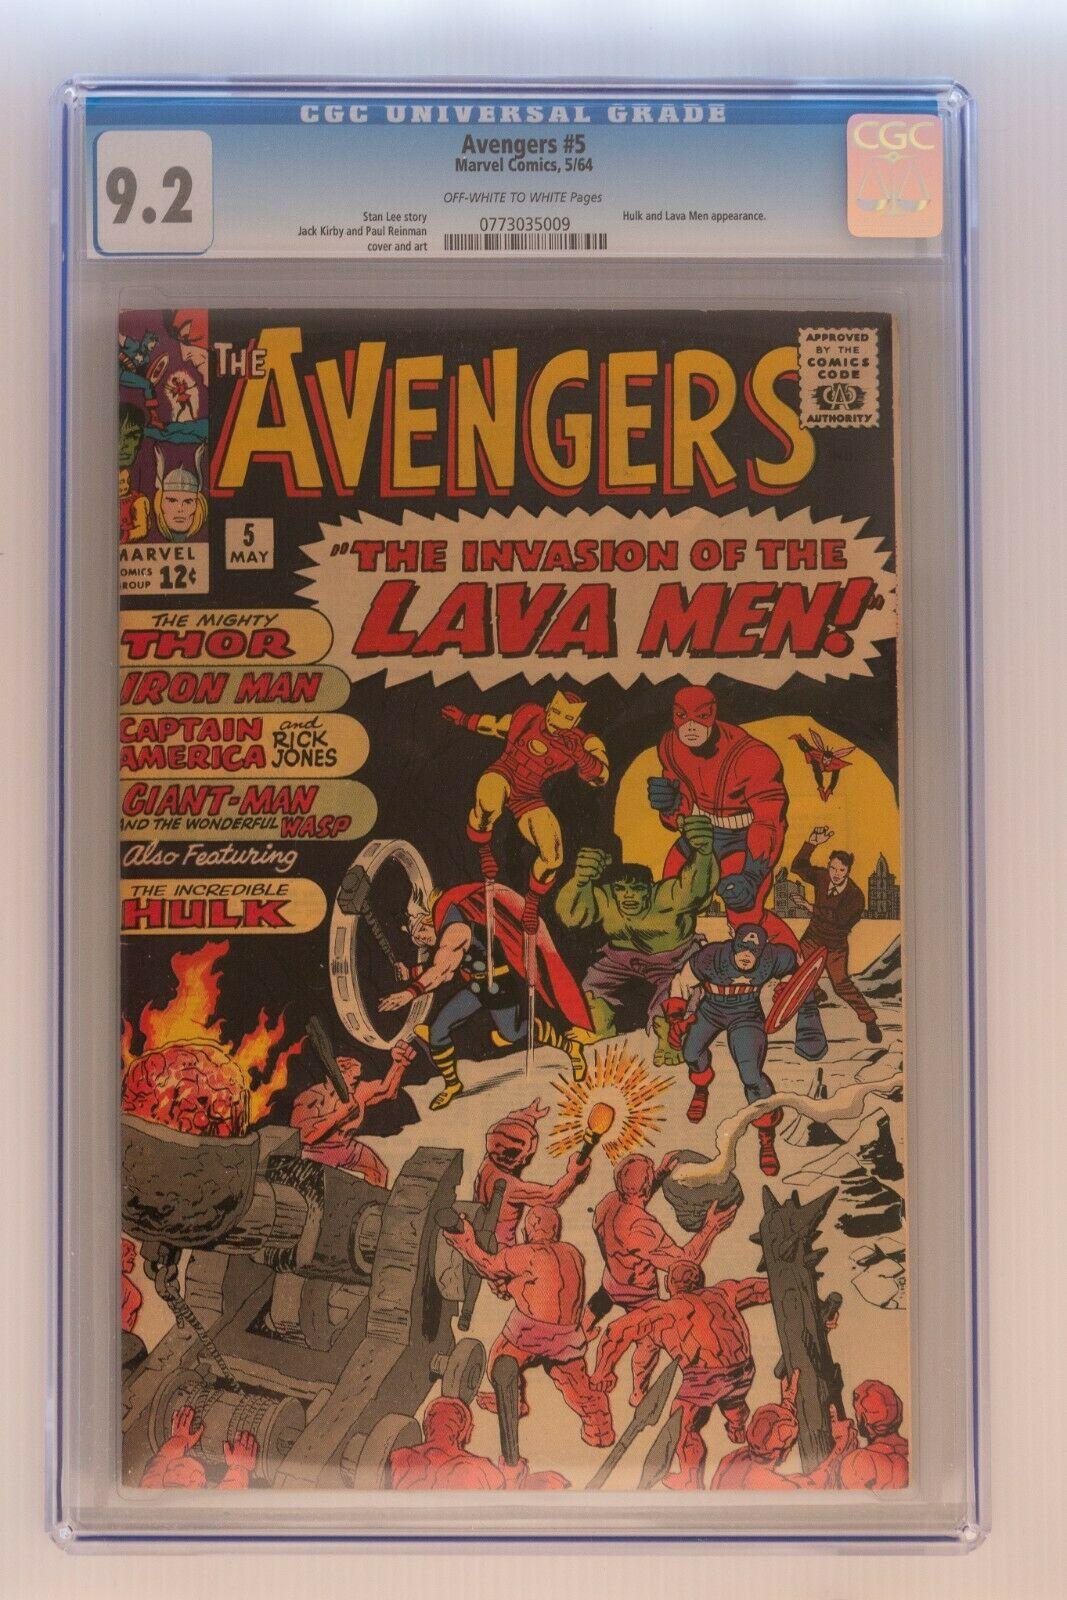 Avengers Issue 5  92 CGC Grade